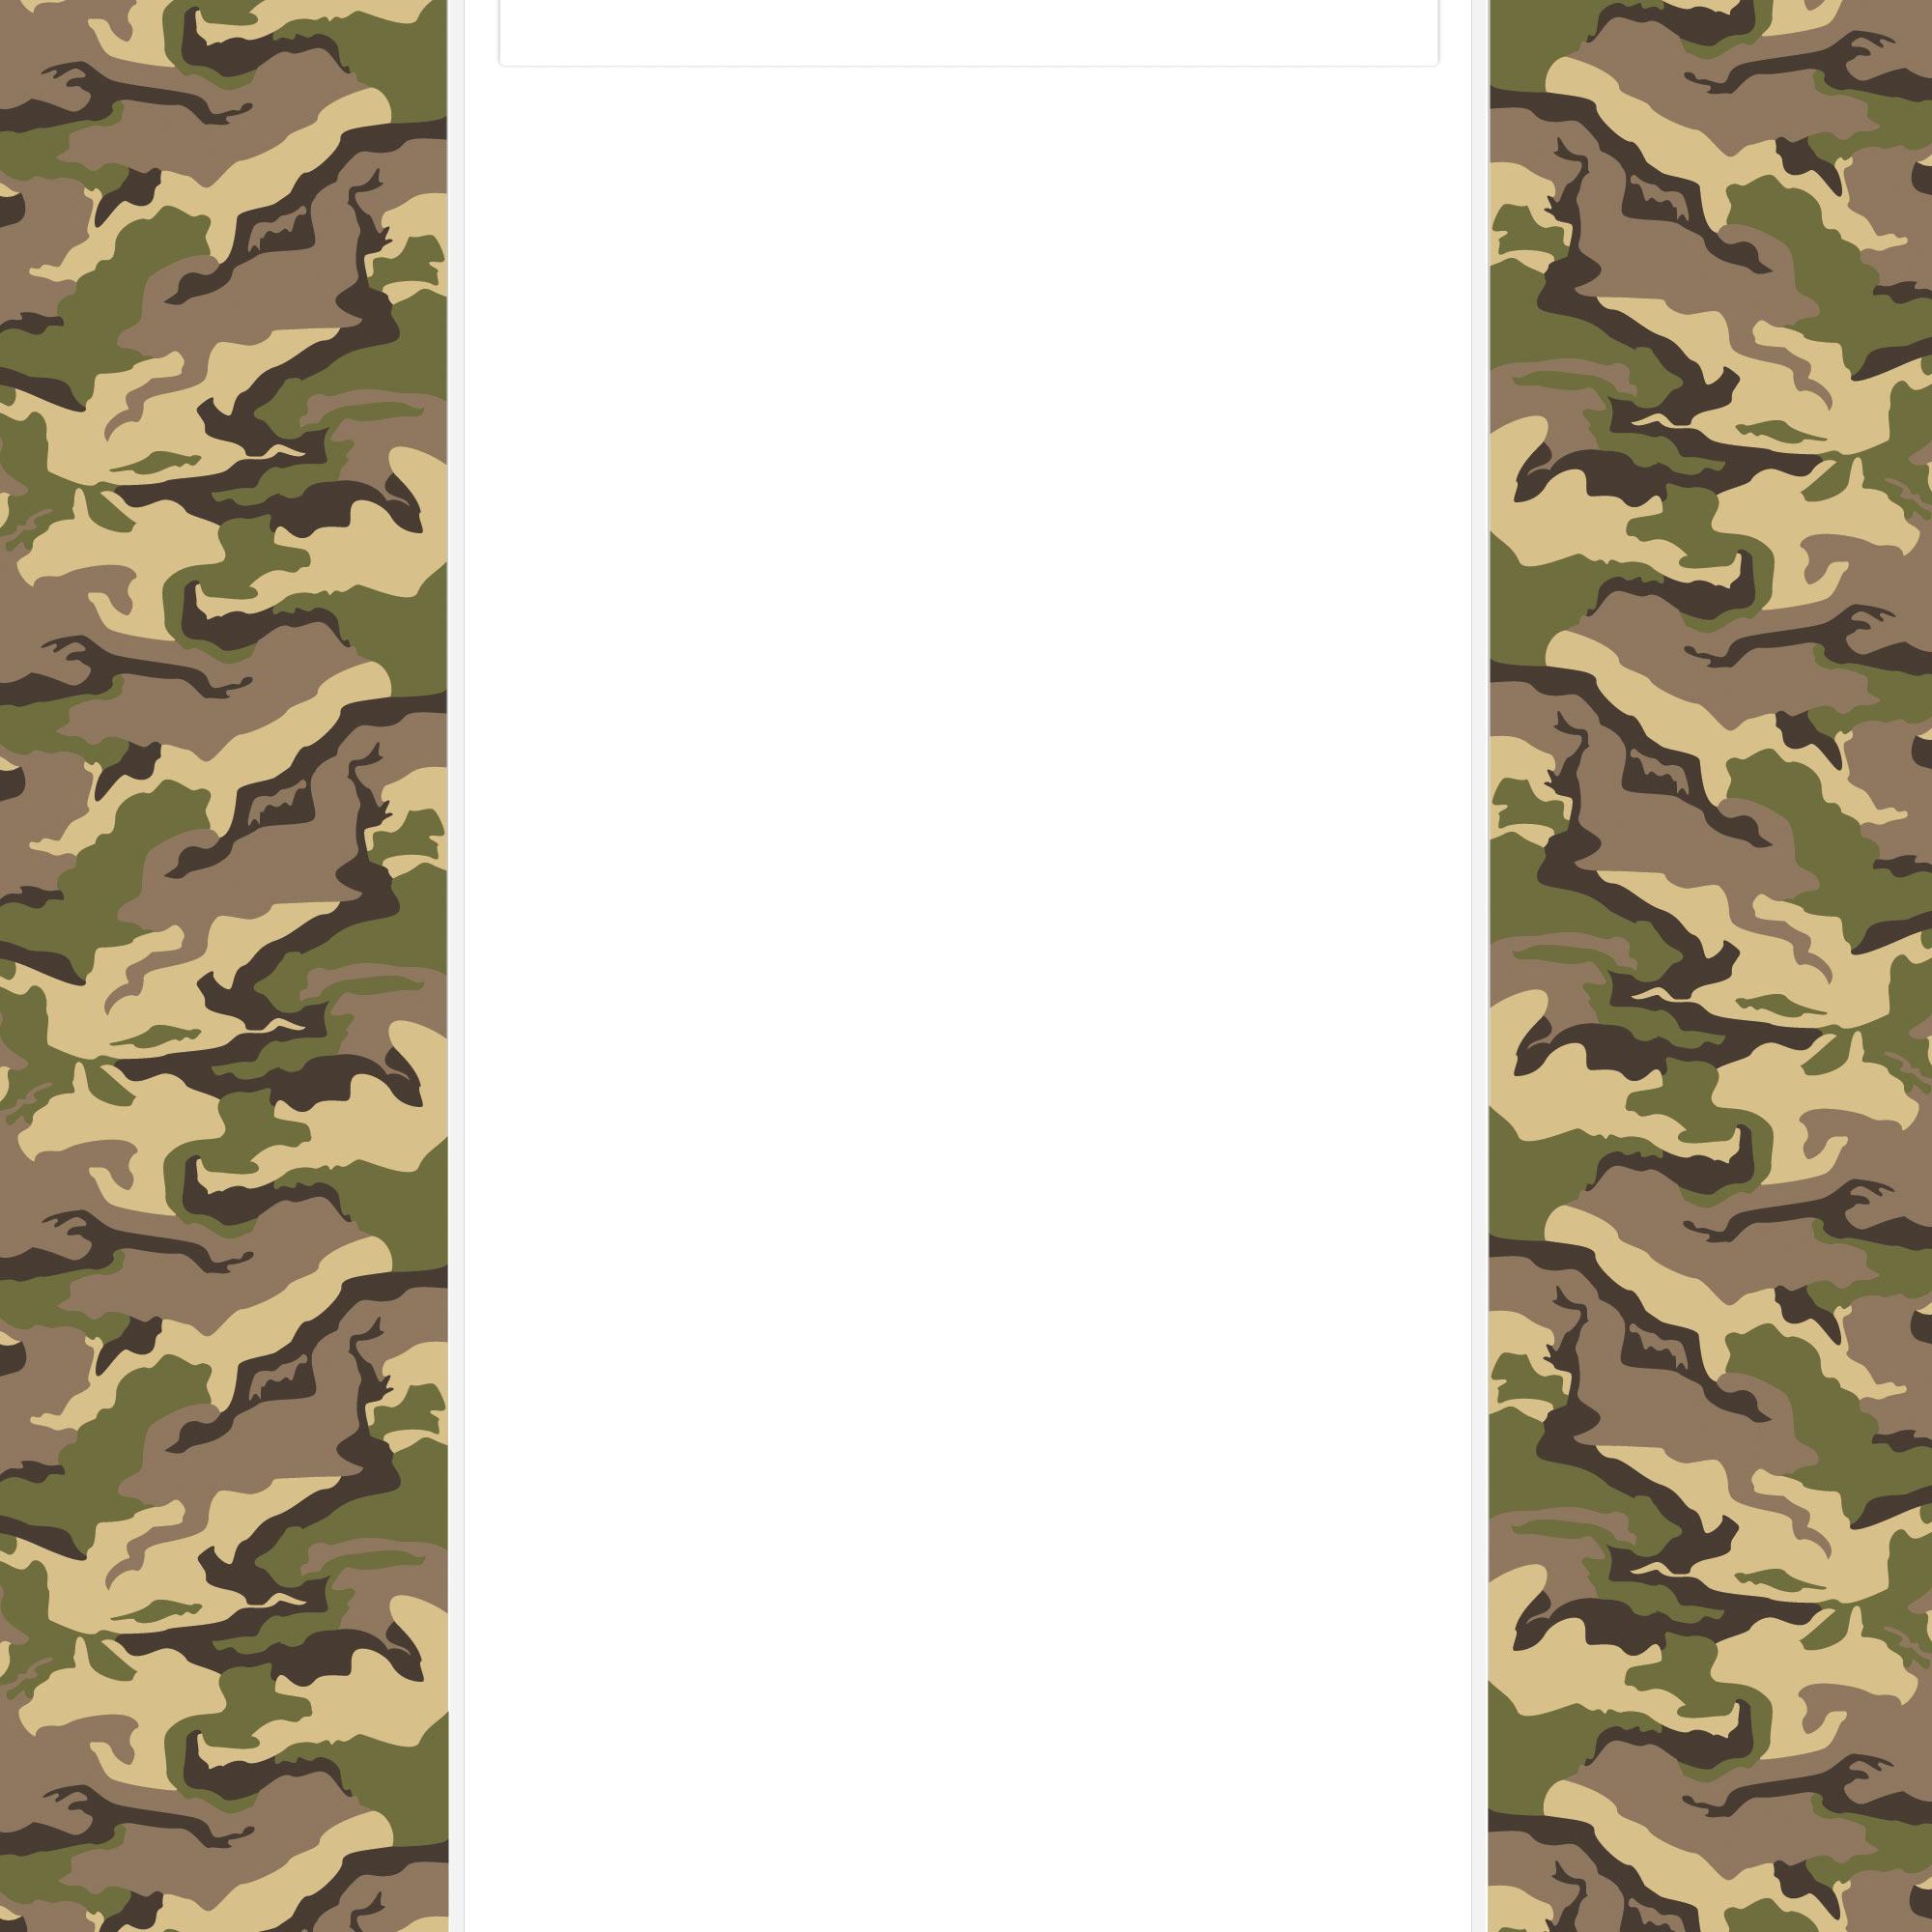 clip art borders military - photo #23